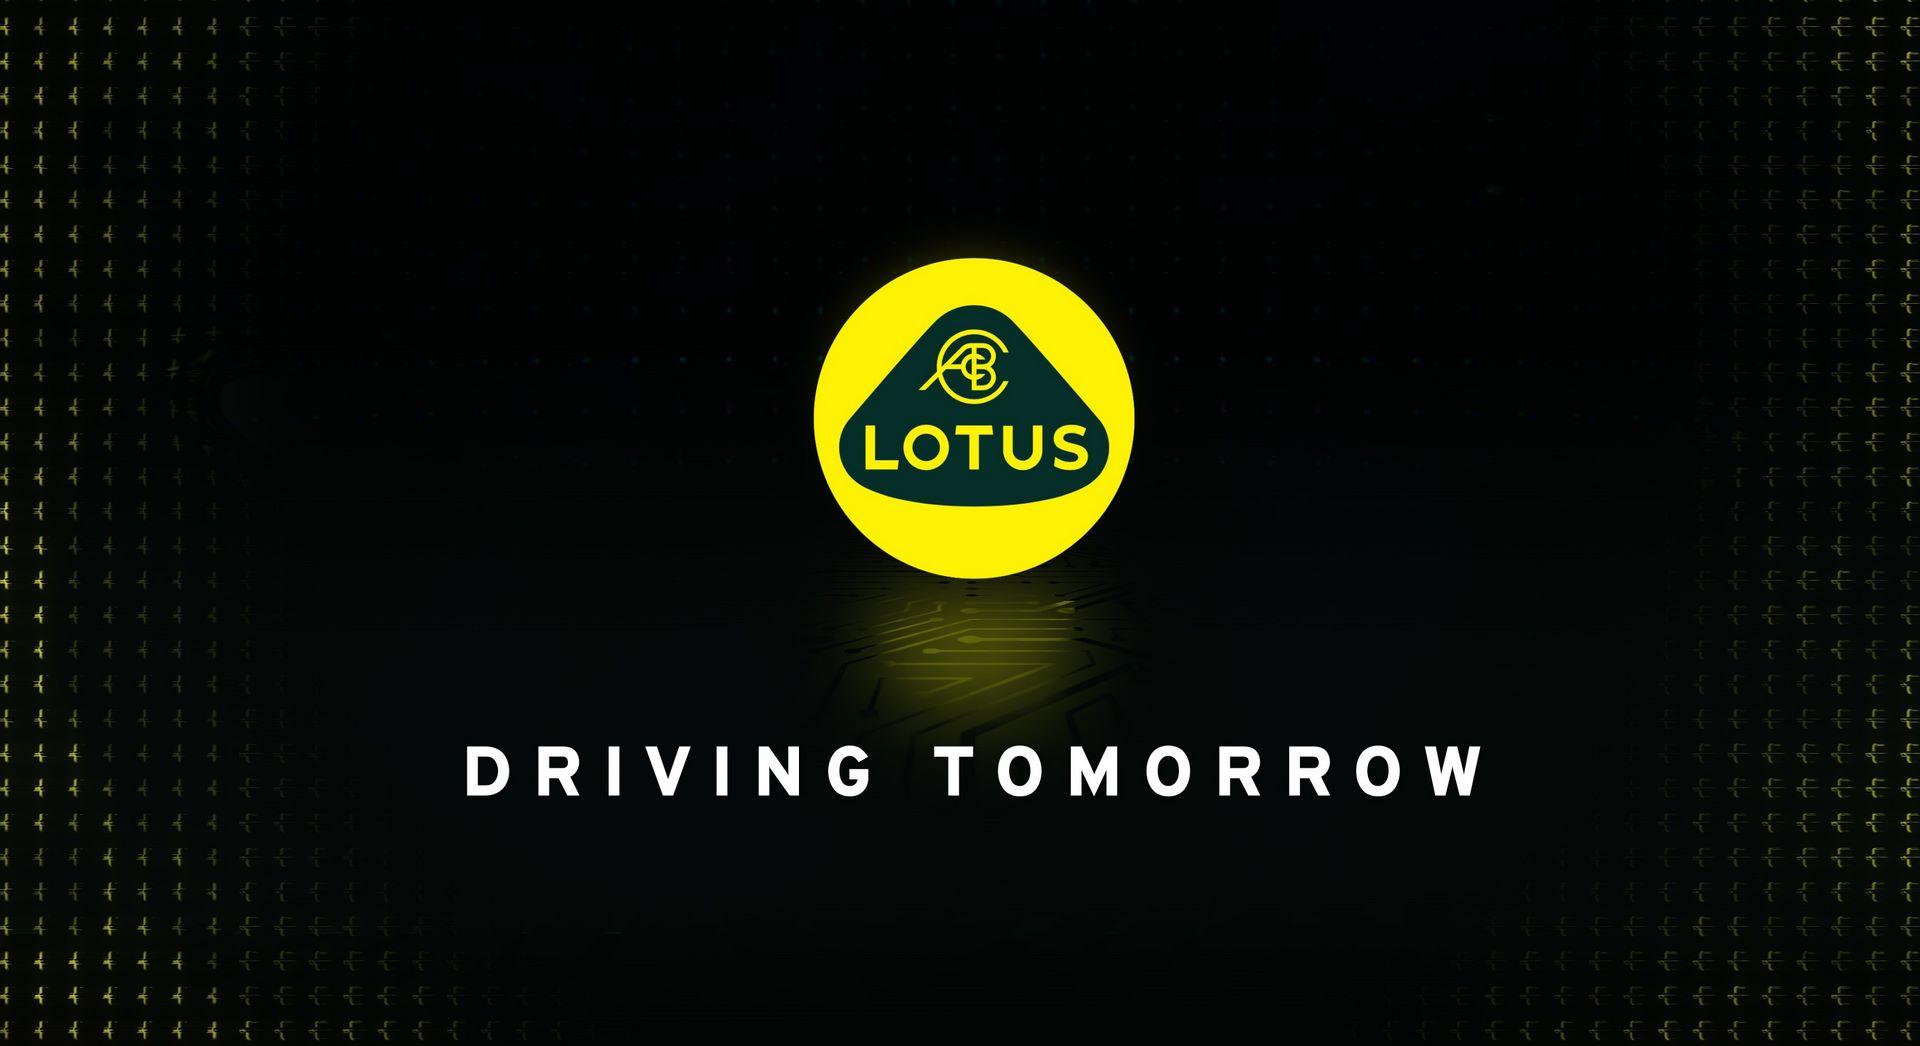 Lotus-Logo-DrivingTomorrow